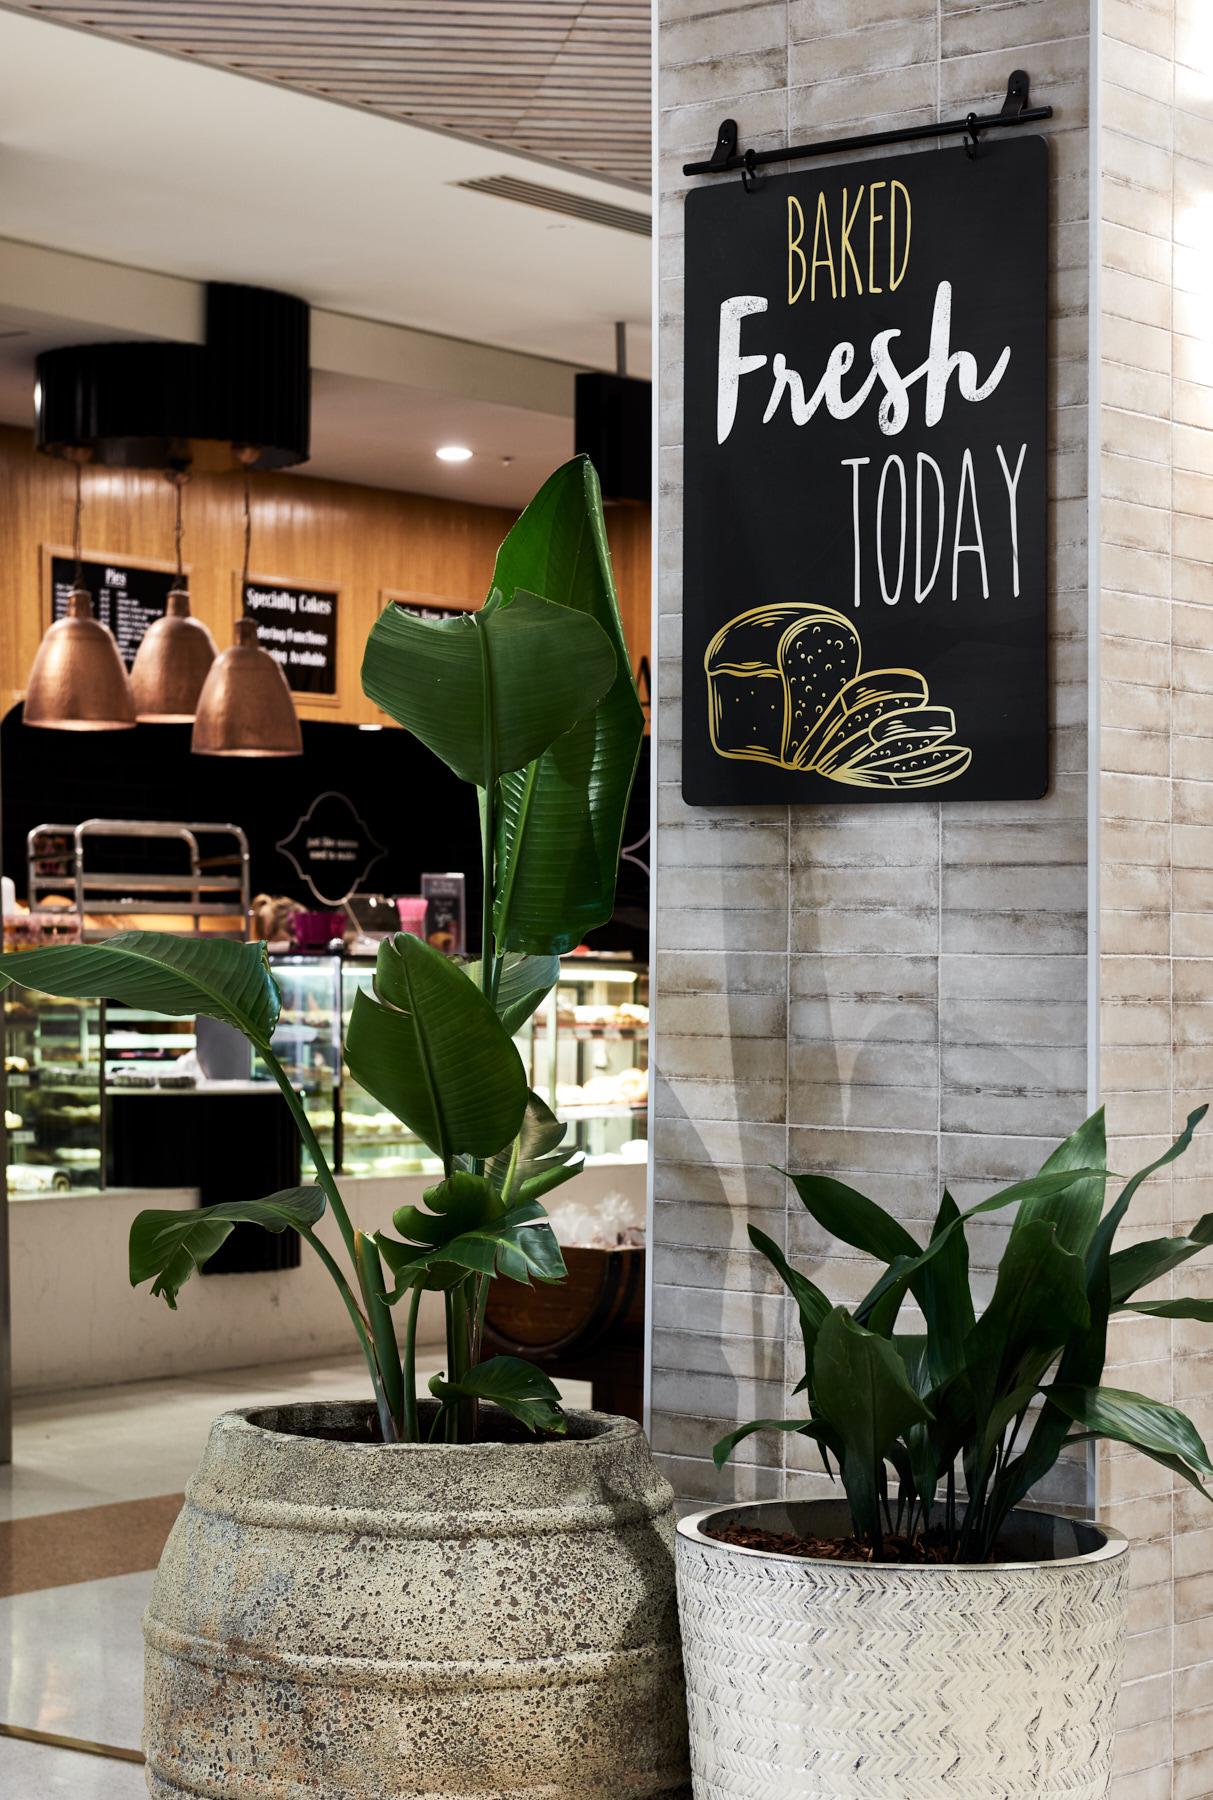 Strathpine Fresh Food Signage